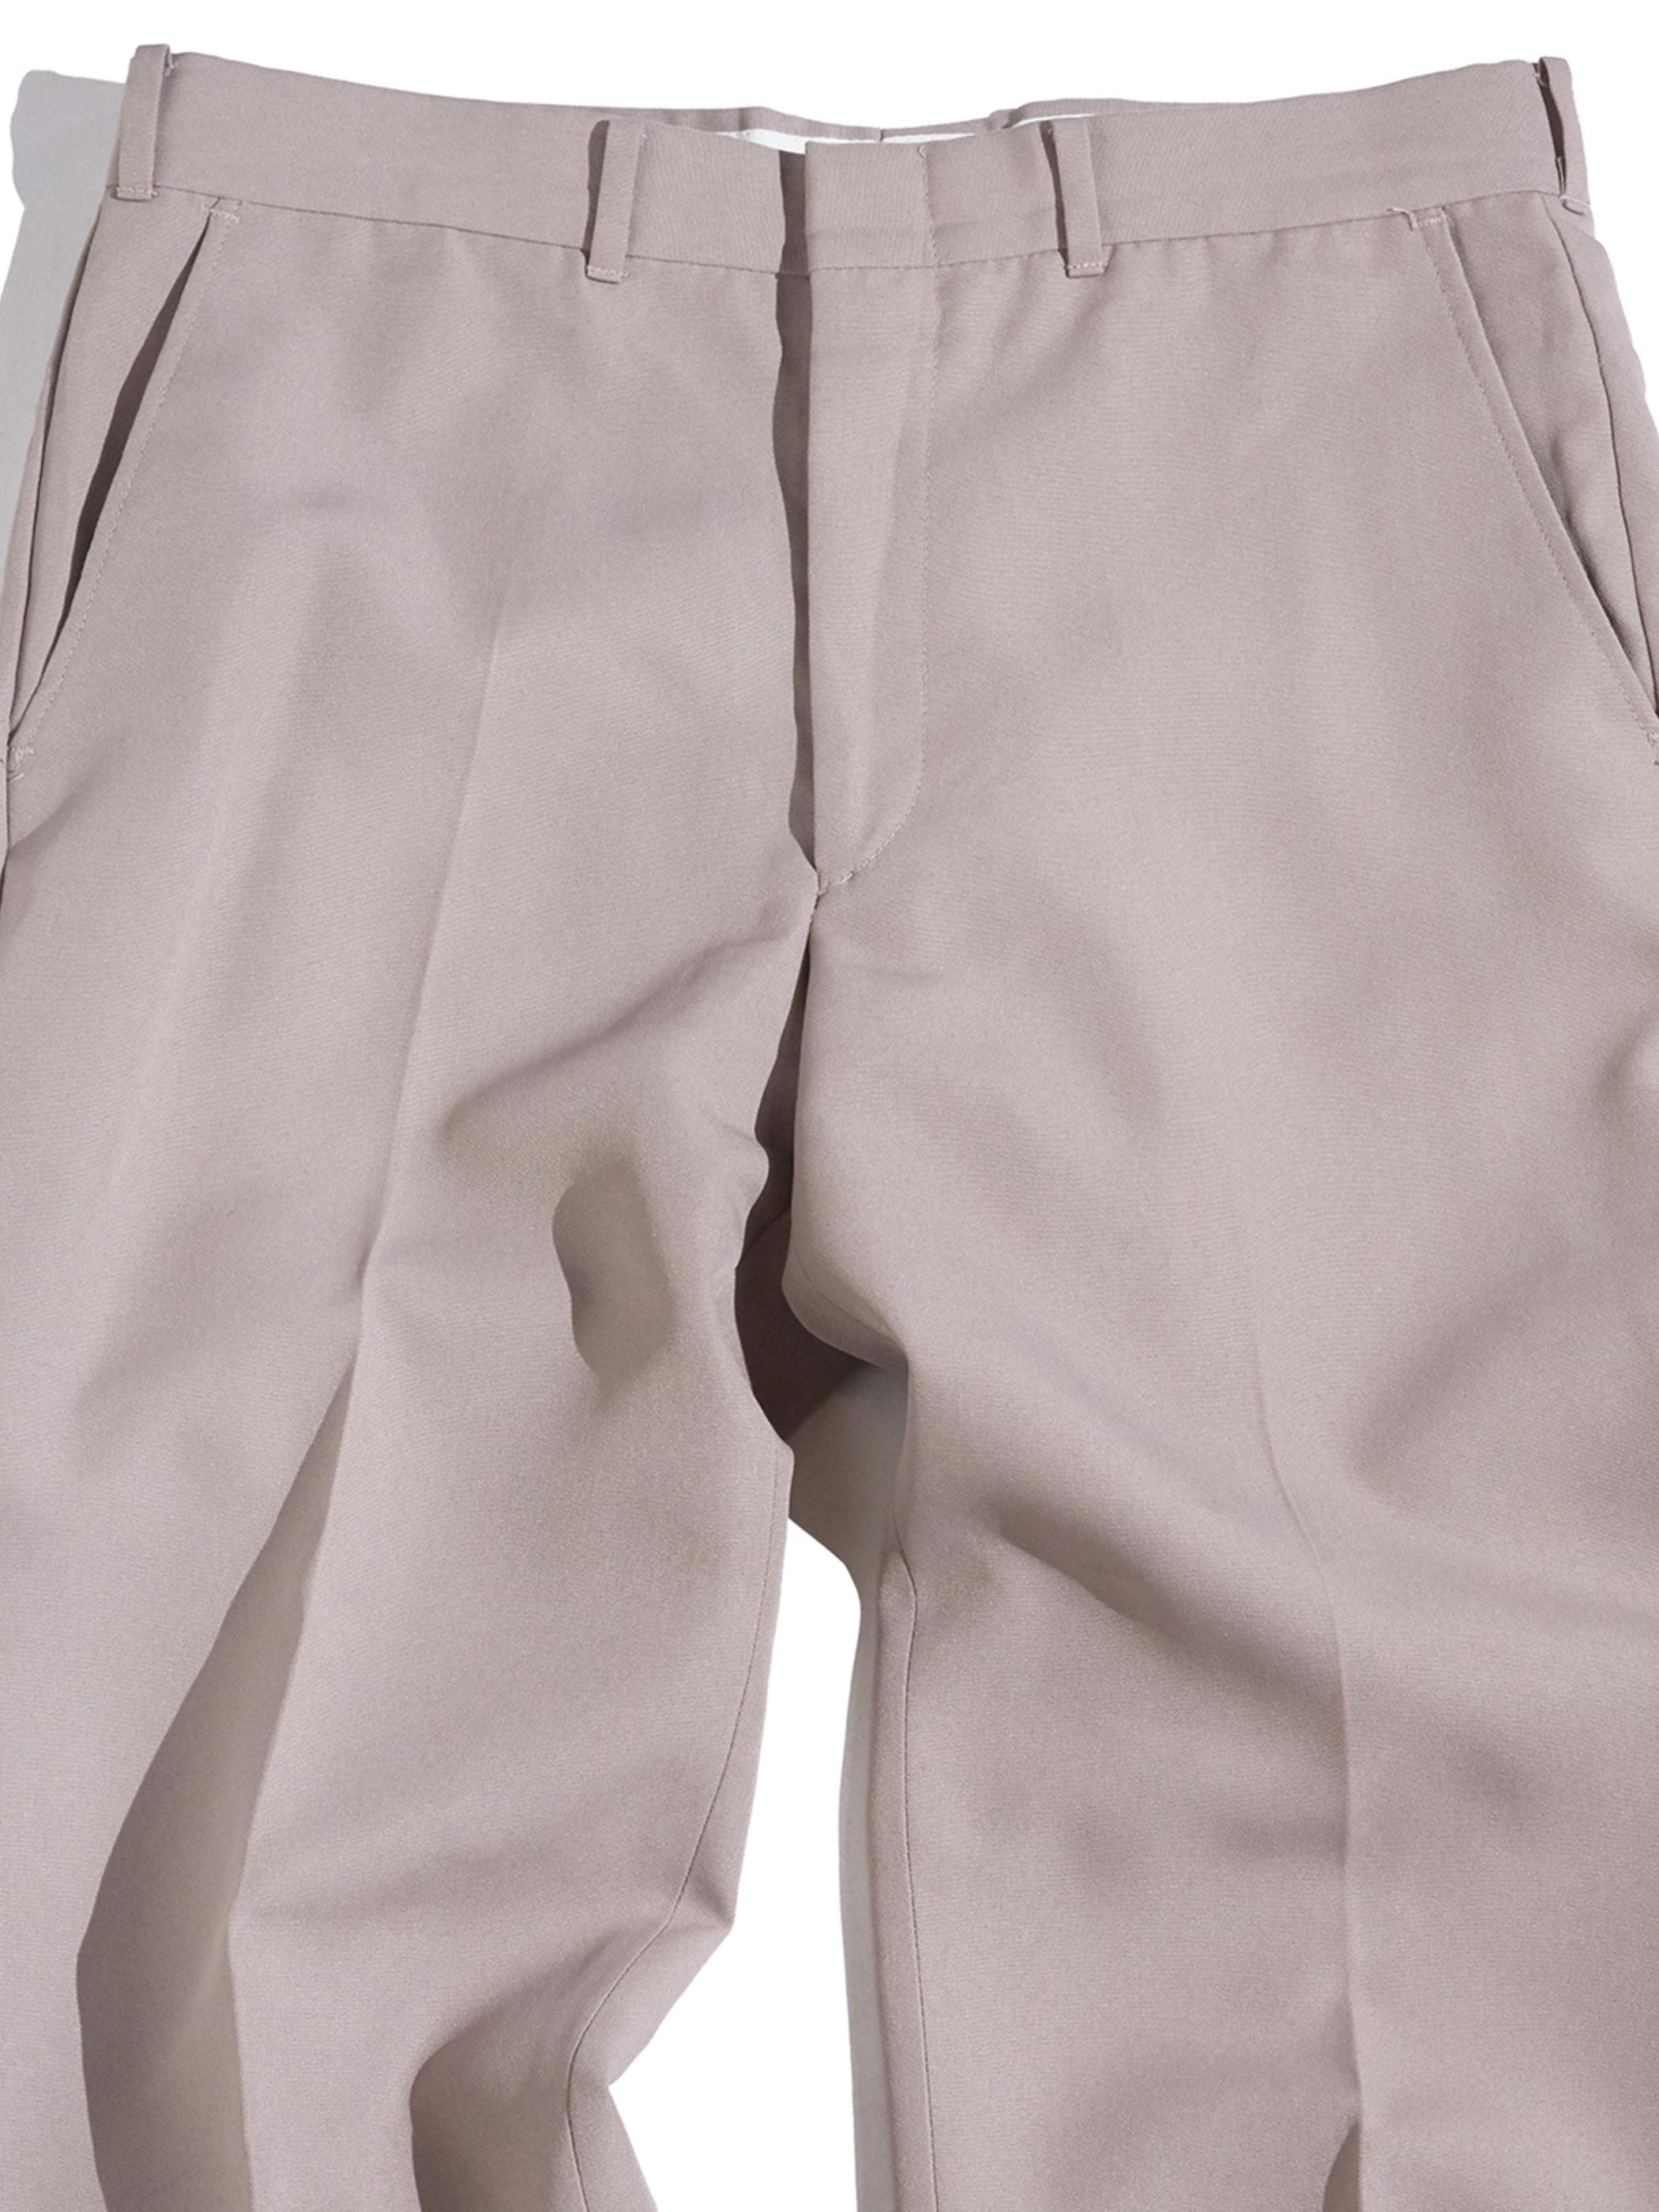 "1970s ""SEARS"" PERMA PREST®︎ polyester slacks -BEIGE-"